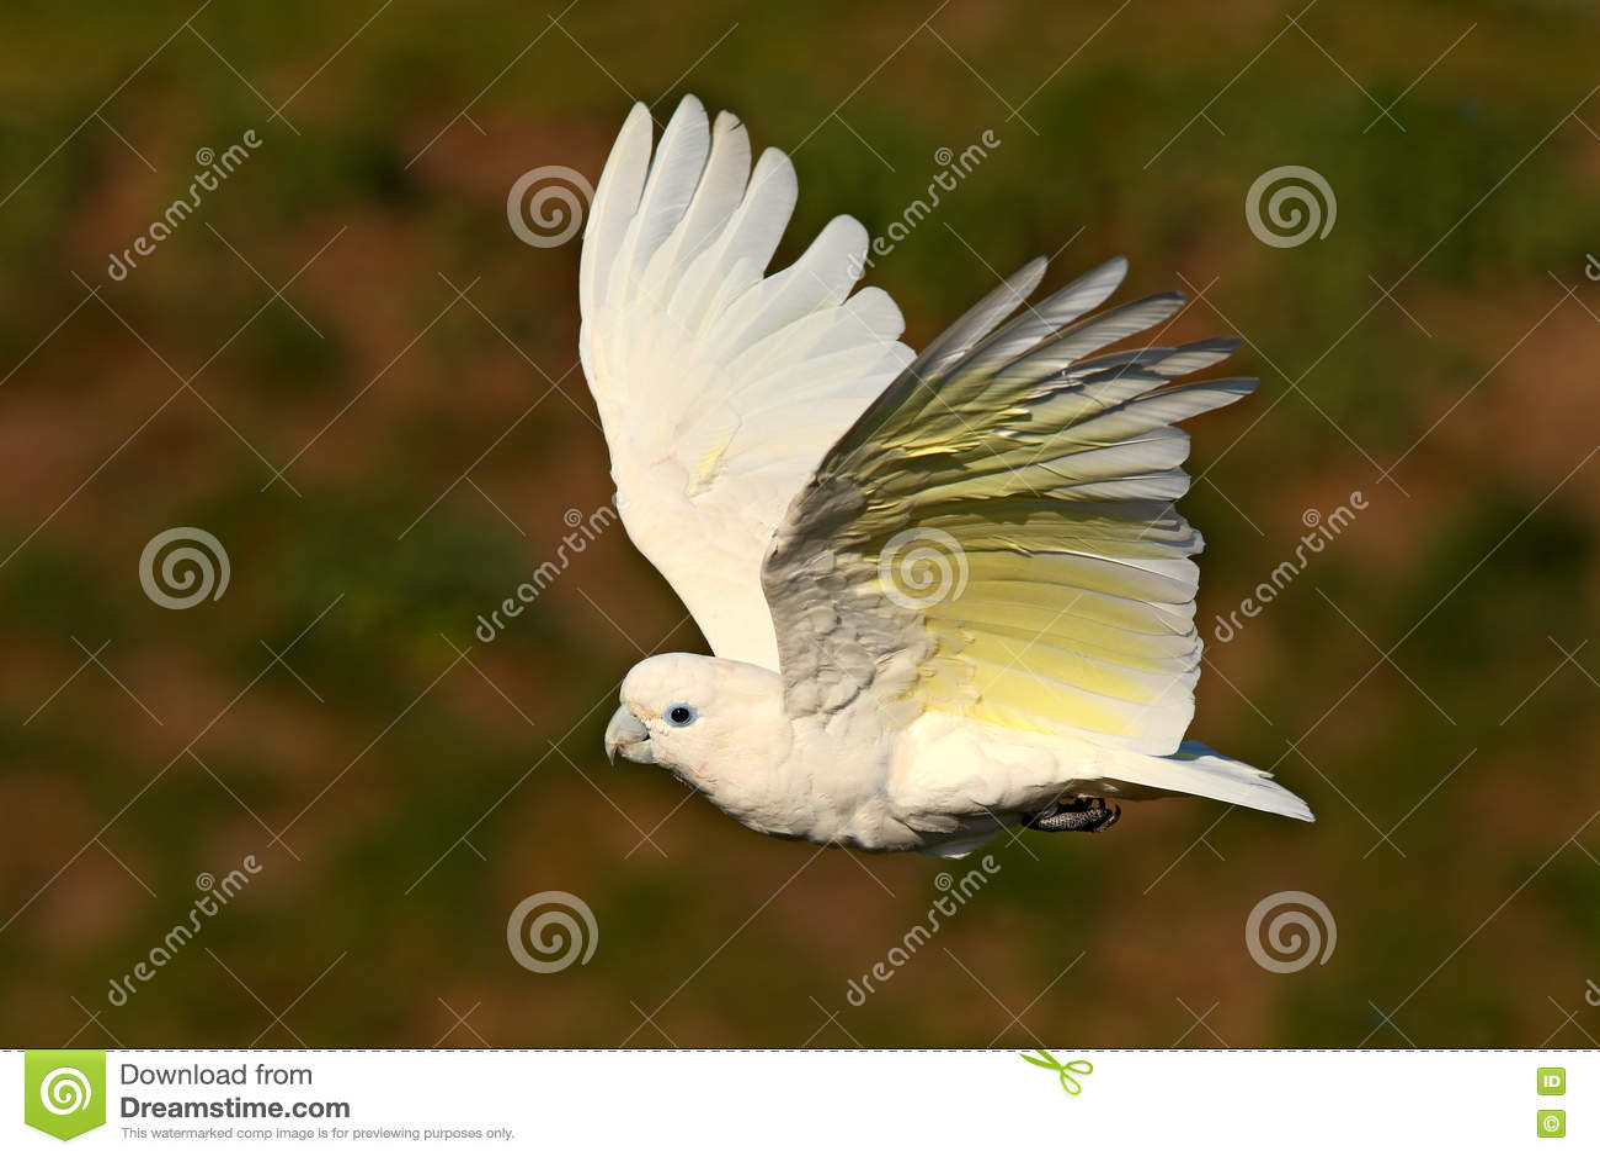 Cockatoo Solomons, ducorpsii Cacatua, πετώντας άσπρος εξωτικός παπαγάλος, πουλί στο βιότοπο φύσης, σκηνή δράσης από τις άγρια περ